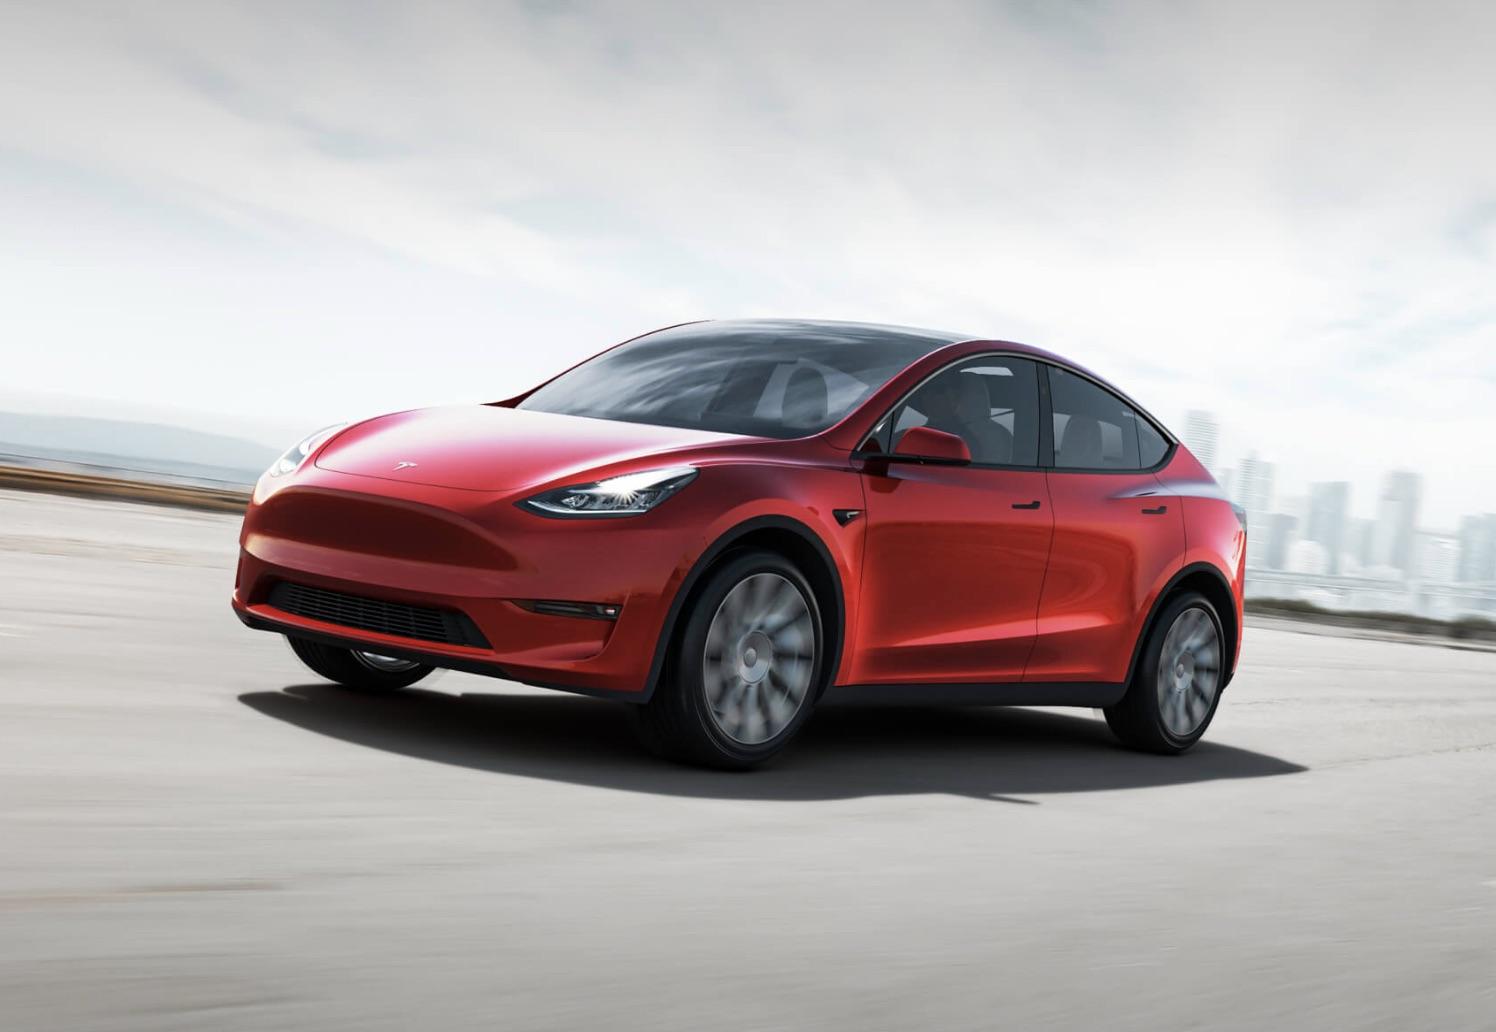 Tesla: è fin troppo facile gabbare i controlli di sicurezza